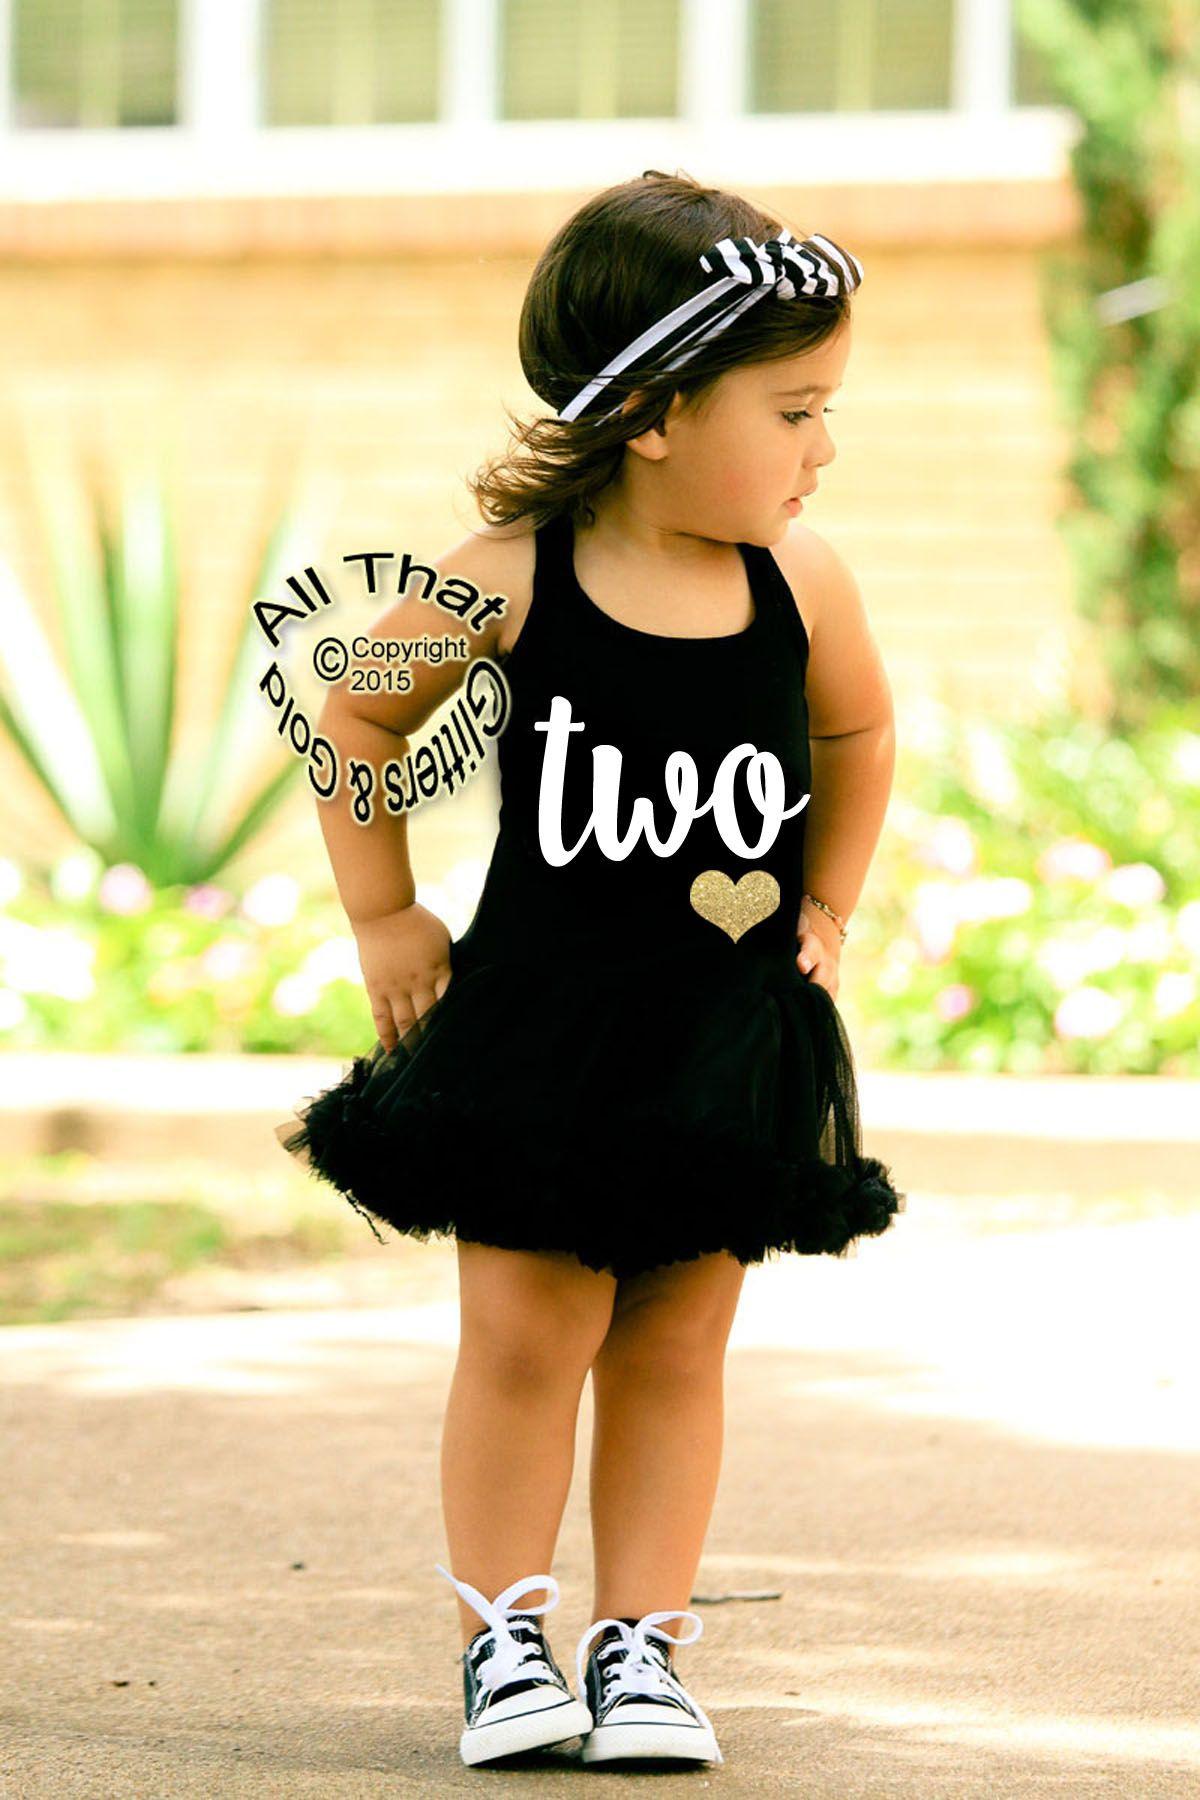 Black and White Glitter Two 2nd Birthday Tutu Dresses For 2 Year Old Toddler  Girls - Girls Birthday Outfit, 2nd Birthday Shirt, ANY AGE, Girls Birthday